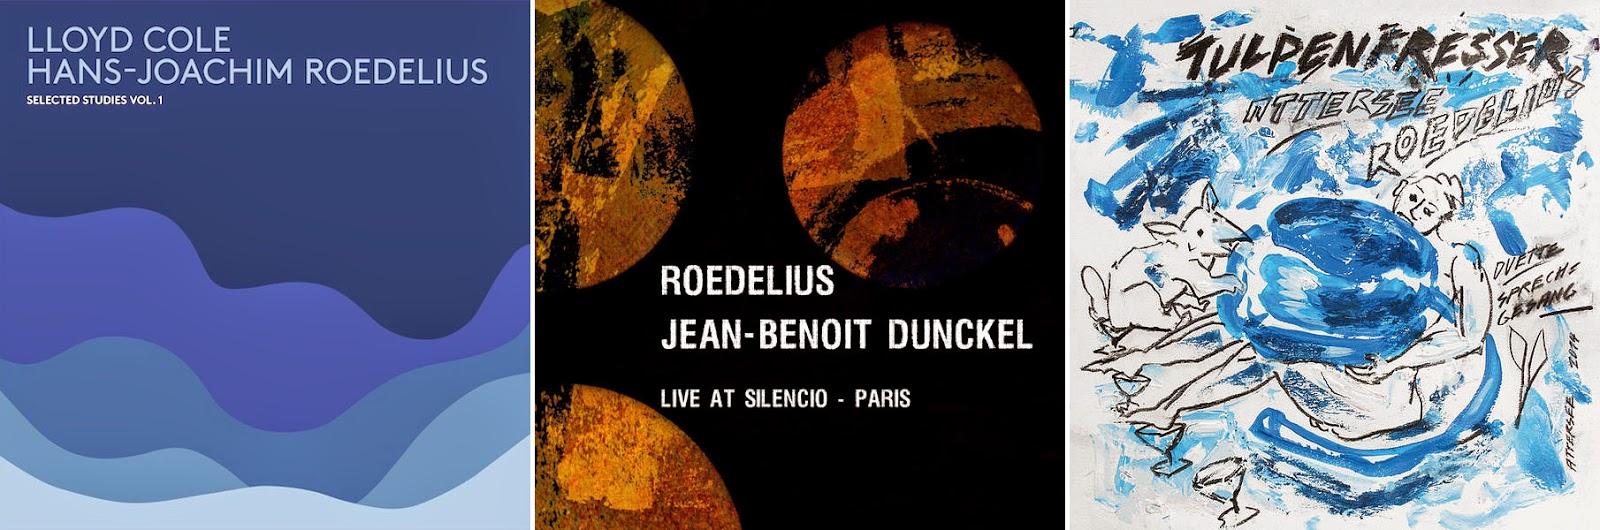 Cole / Roedelius – Selected Studies / Roedelius / Dunckel – Live at Silencio / Attersee / Roedelius – Tulpenfresser / source : discogs, discogs + qobuz